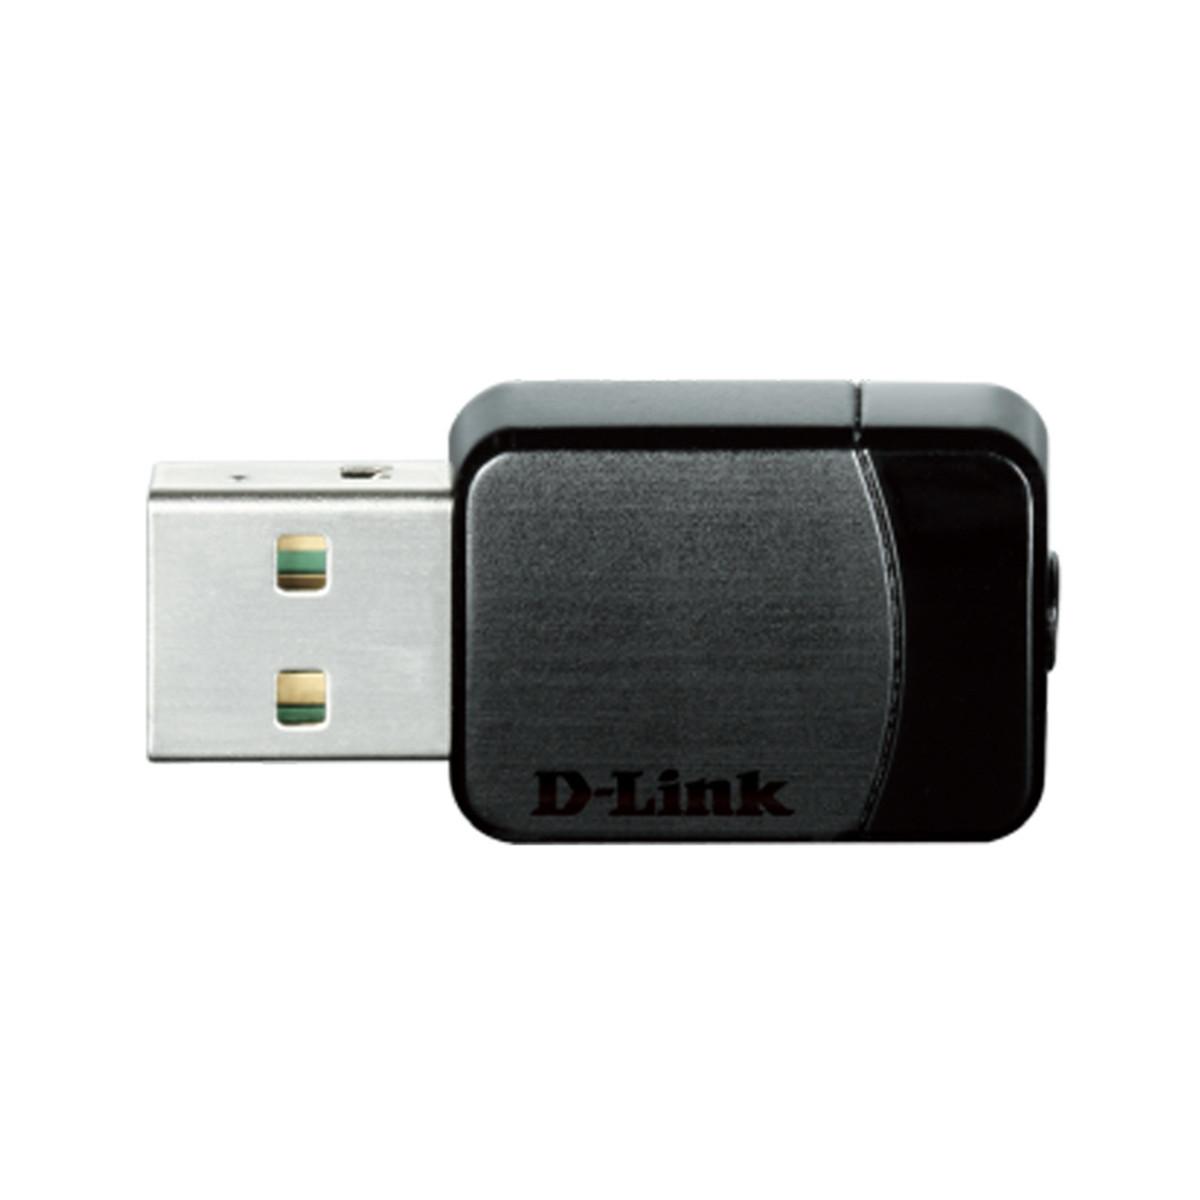 Adaptador de Rede Wireless D-Link DWA-171 Entrada USB Gamer 600Mbps